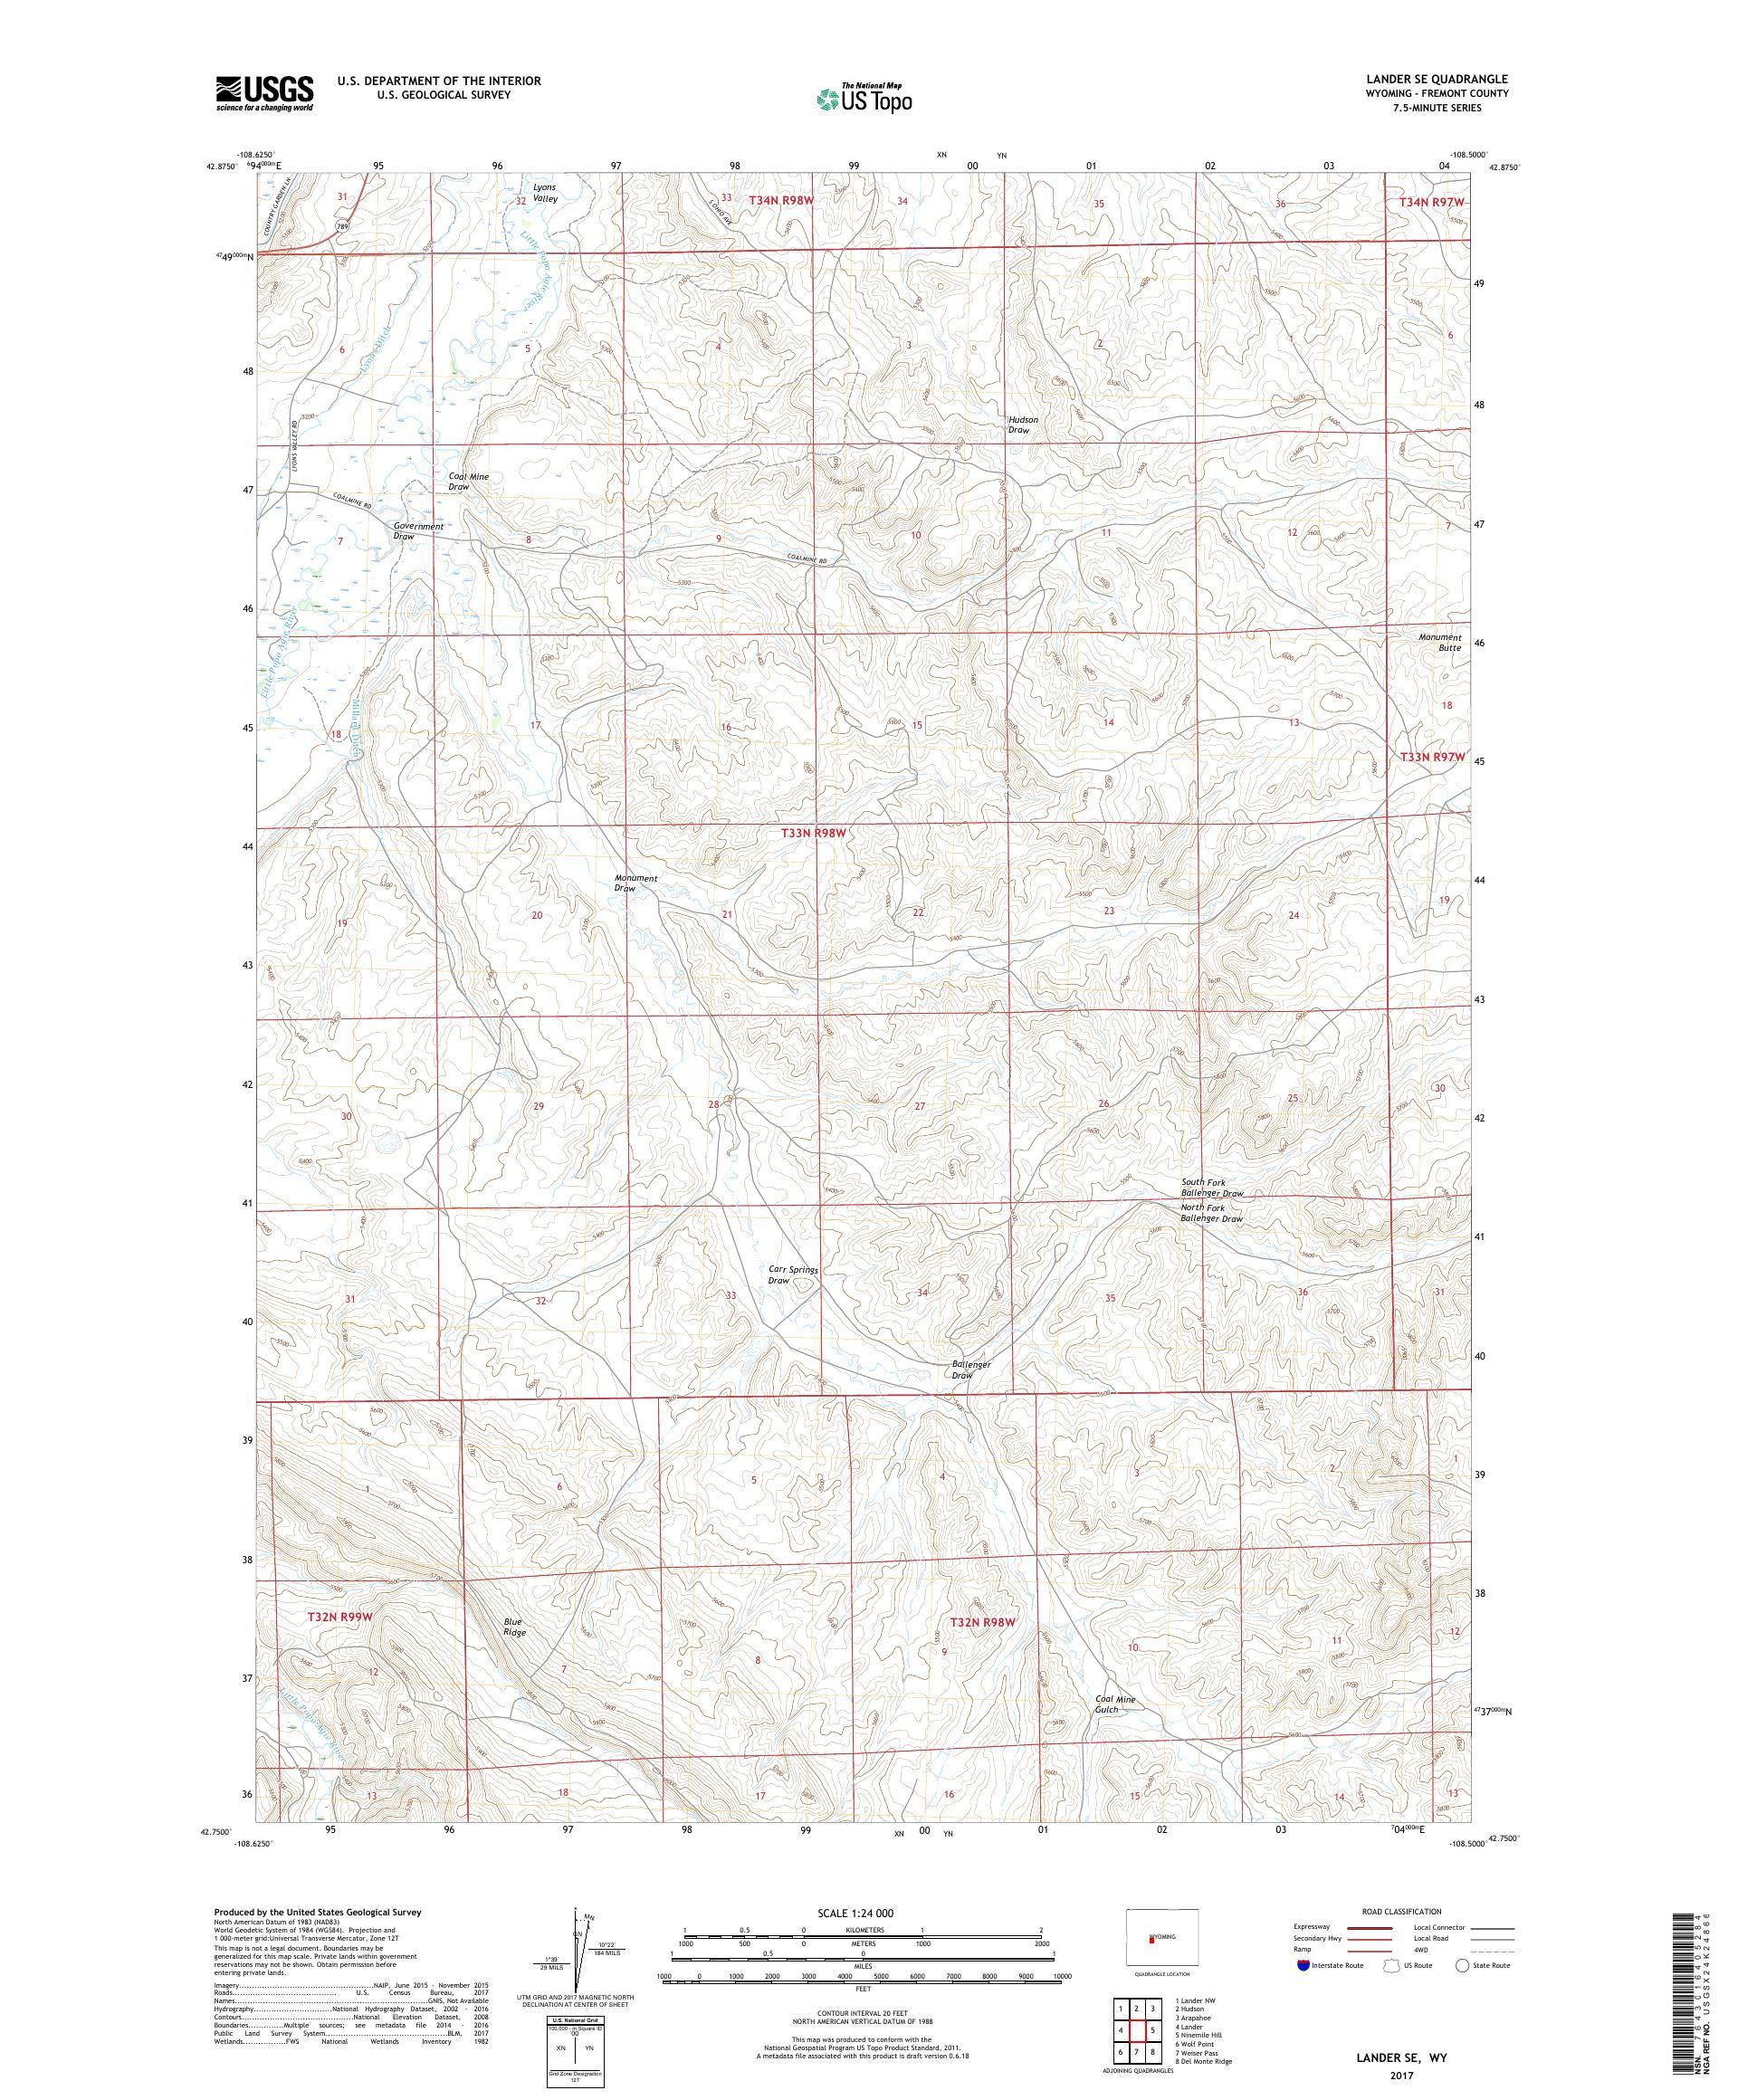 MyTopo Lander SE, Wyoming USGS Quad Topo Map